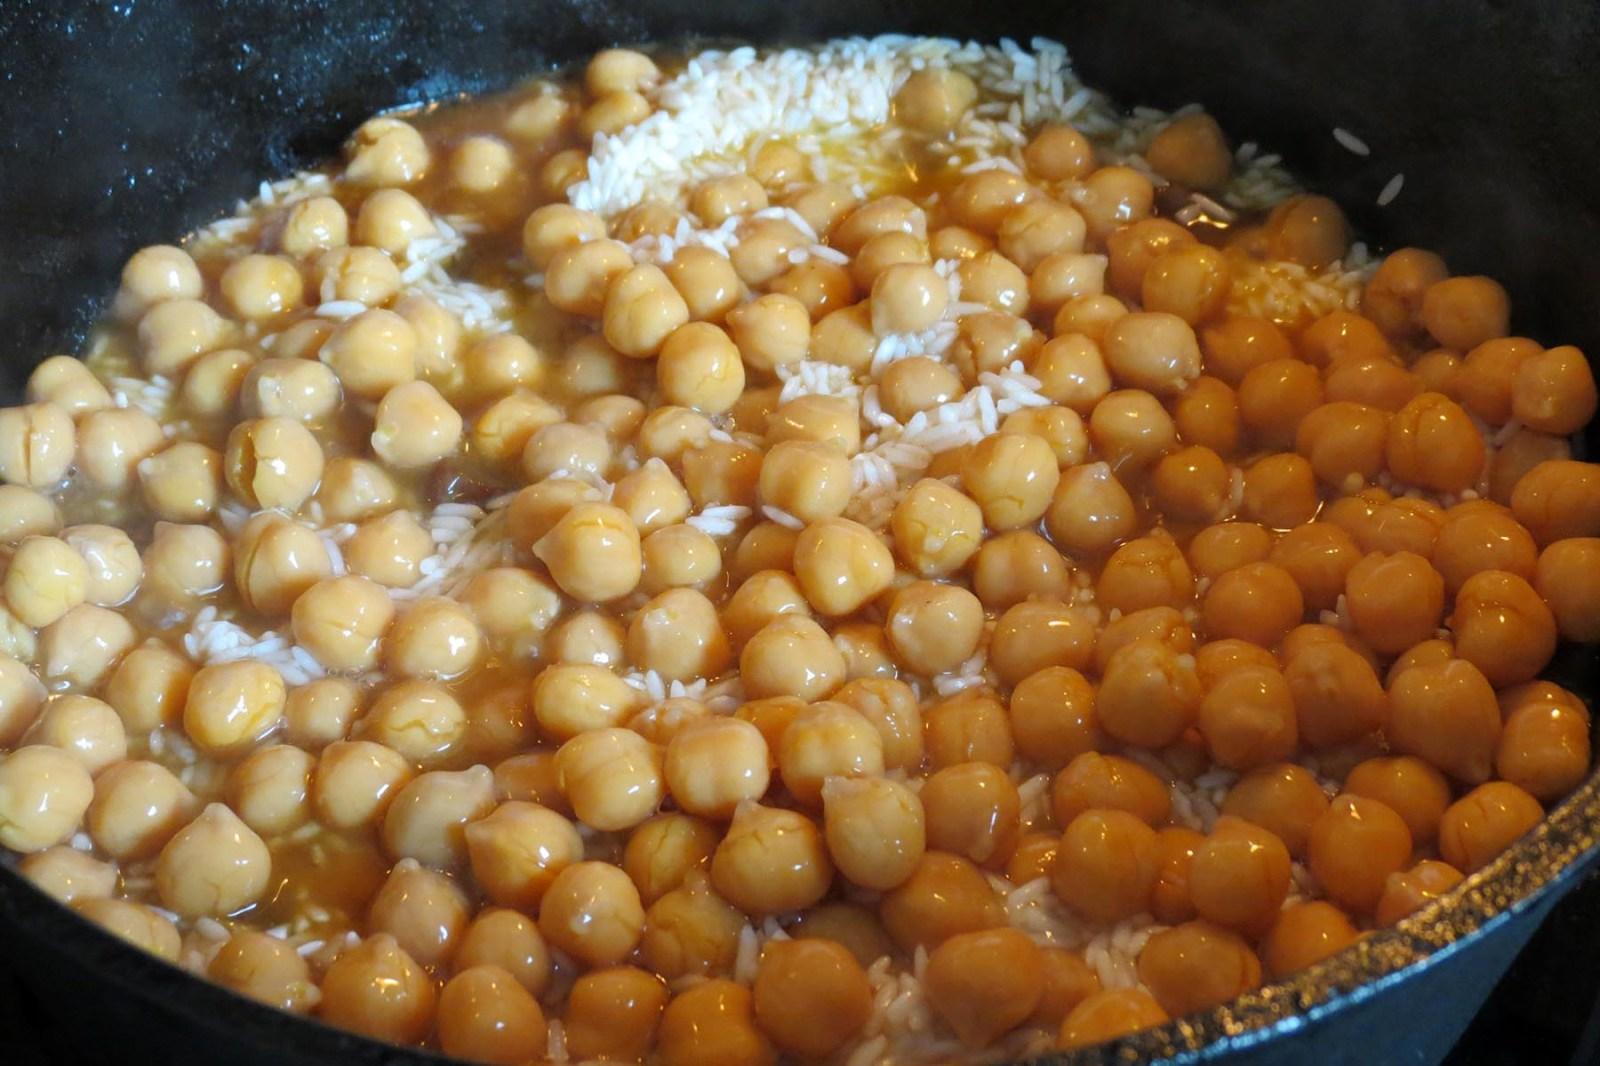 adding-garbanzo-beans